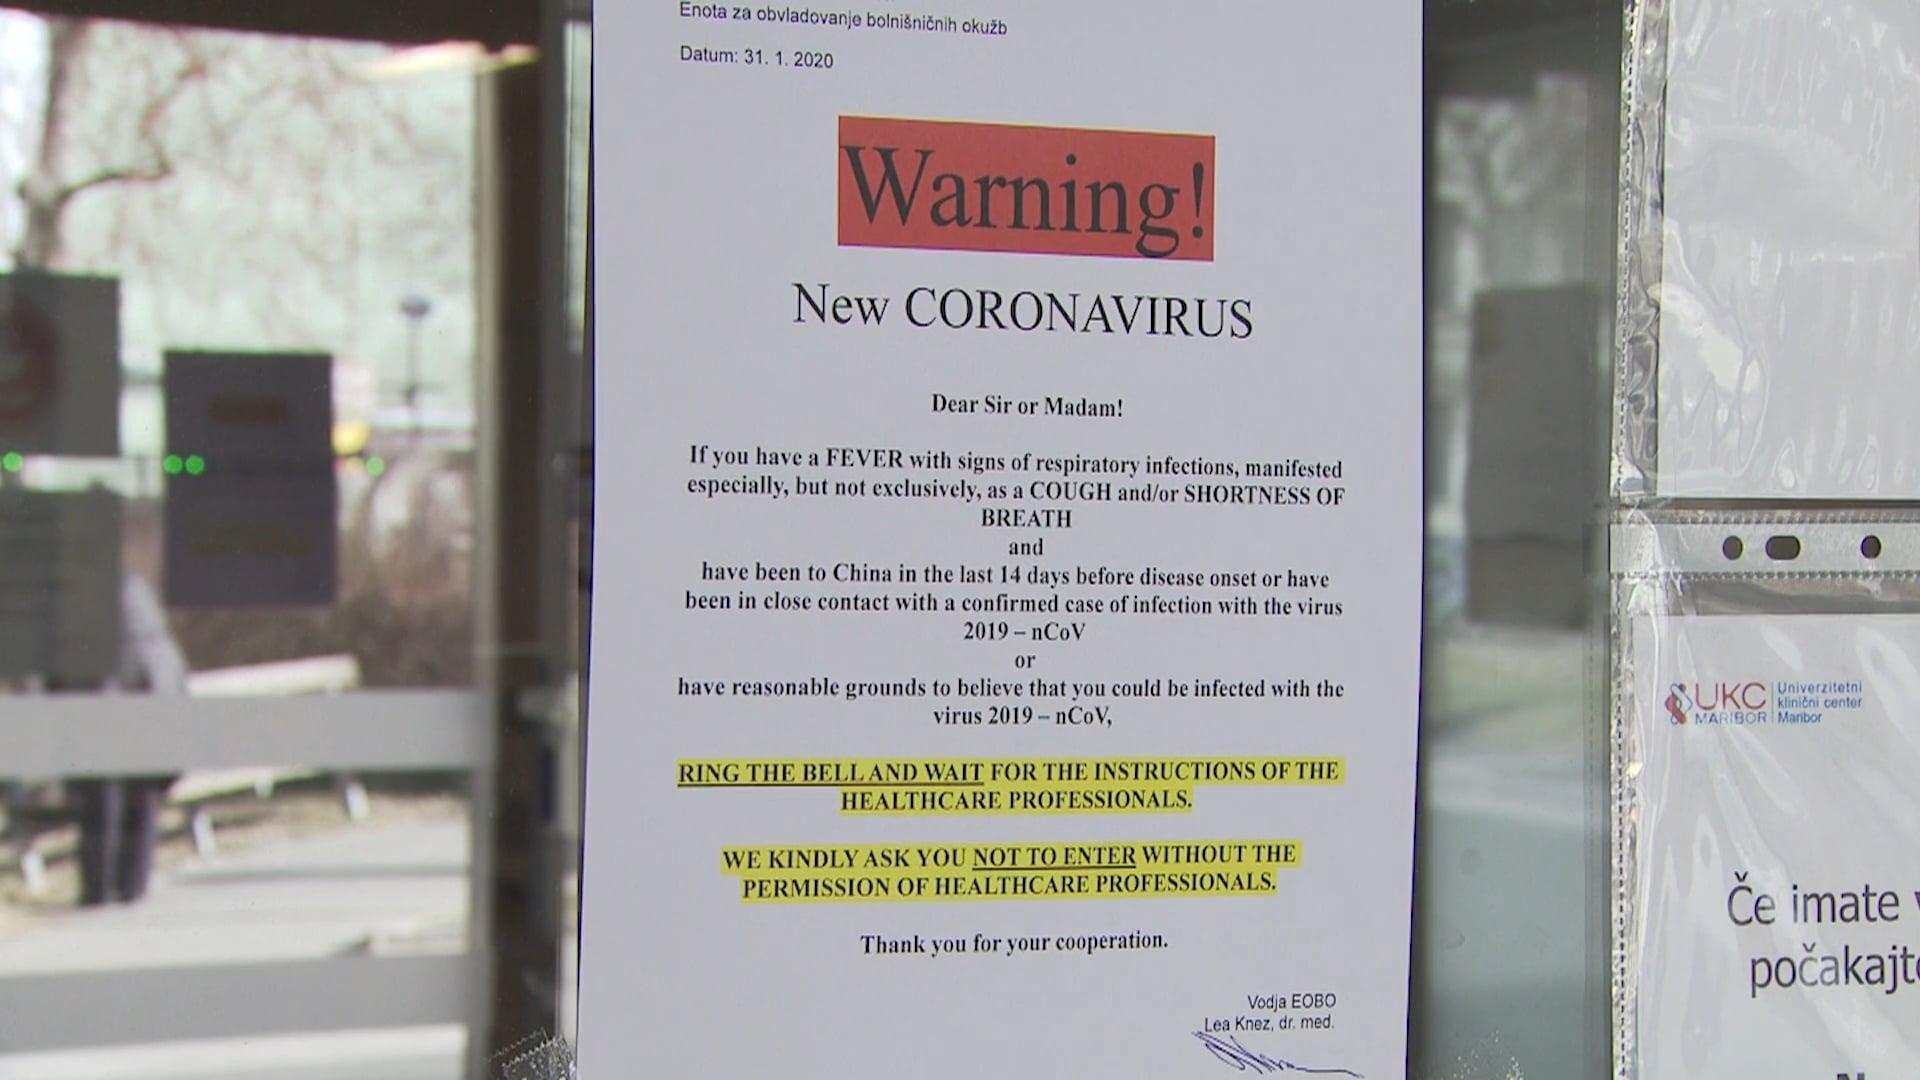 V UKC Maribor pripravljeni na novi koronavirus